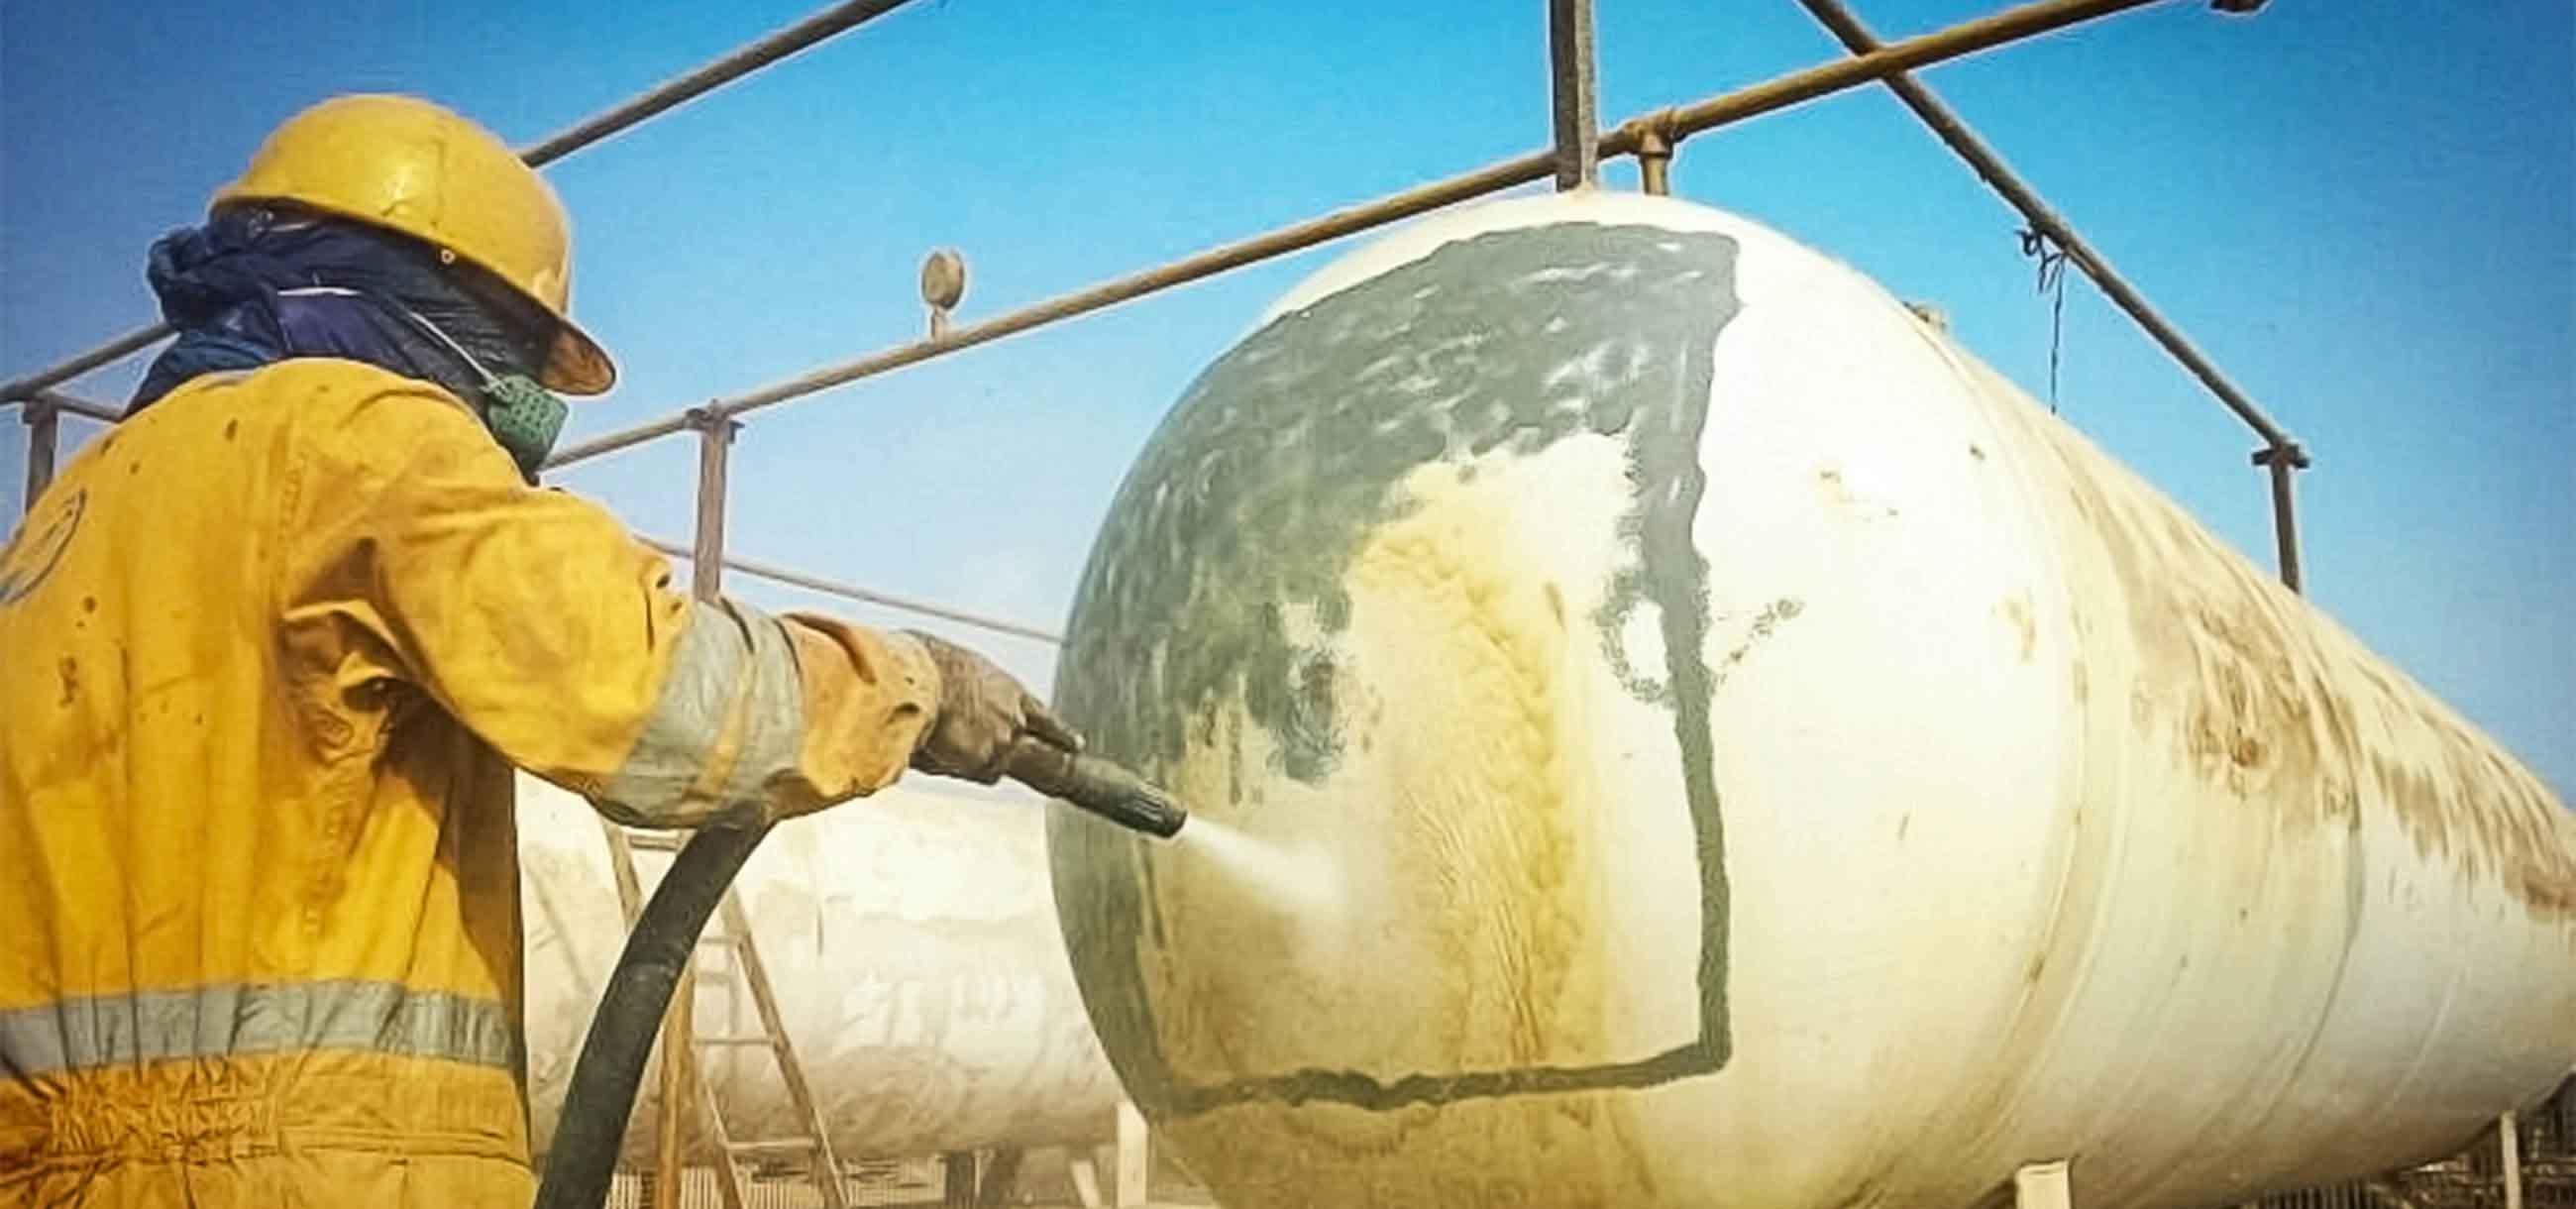 blasting large industrial tank